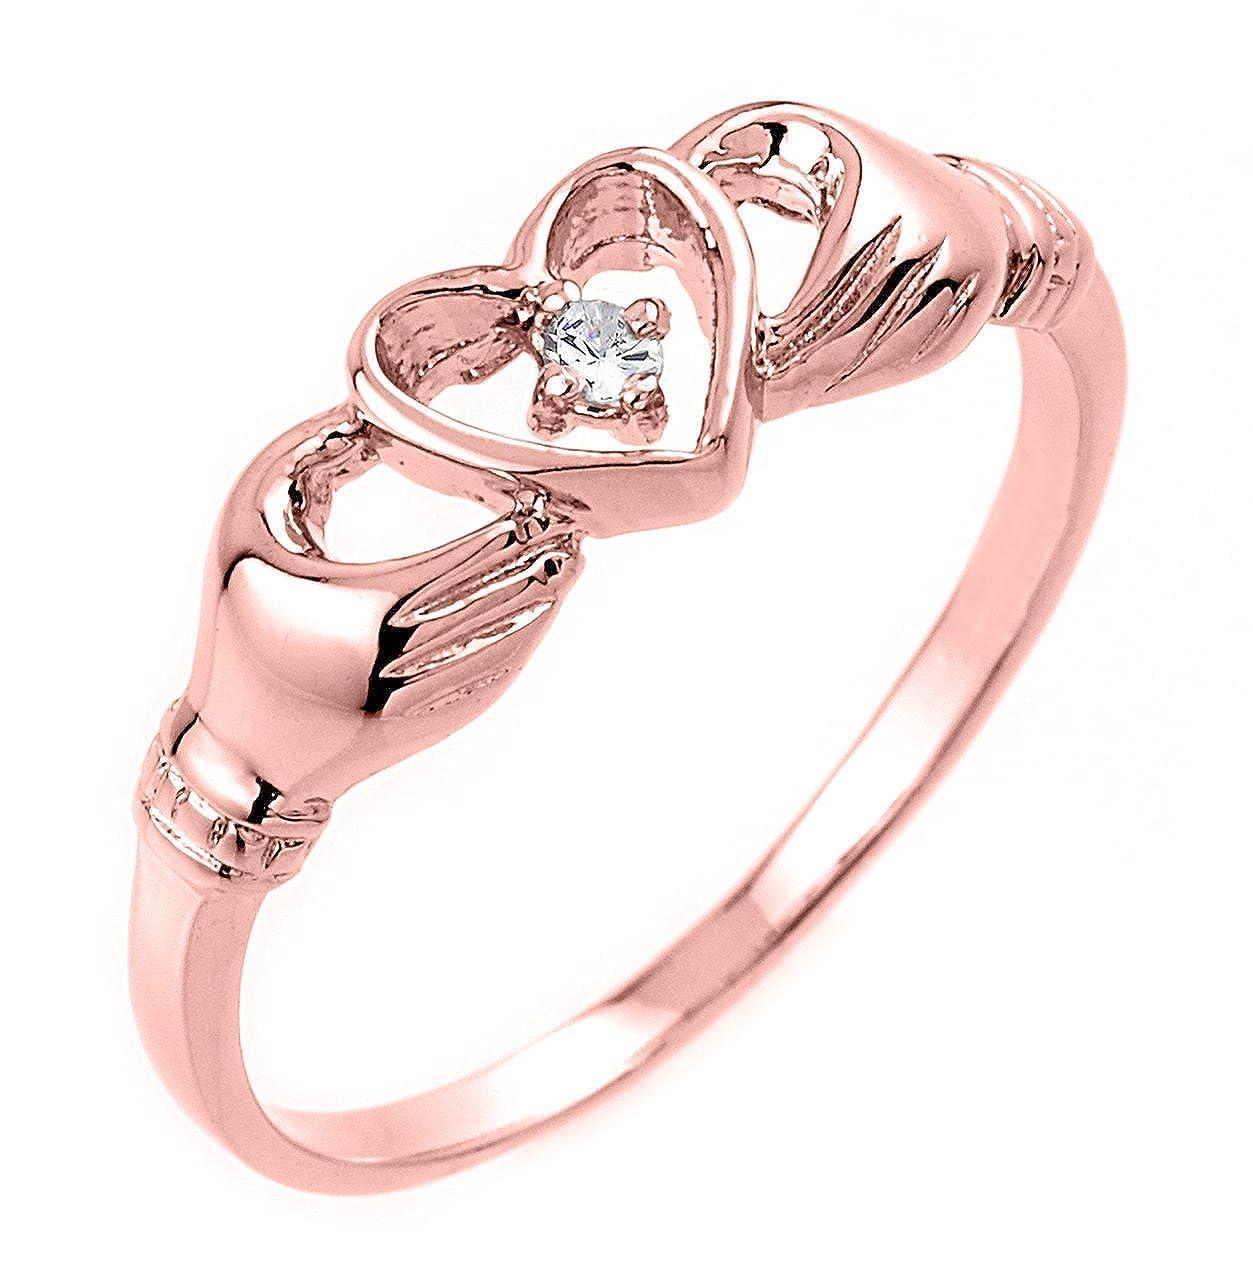 Amazon.com: High Polish 14k Rose Gold Diamond Solitaire Claddagh ...